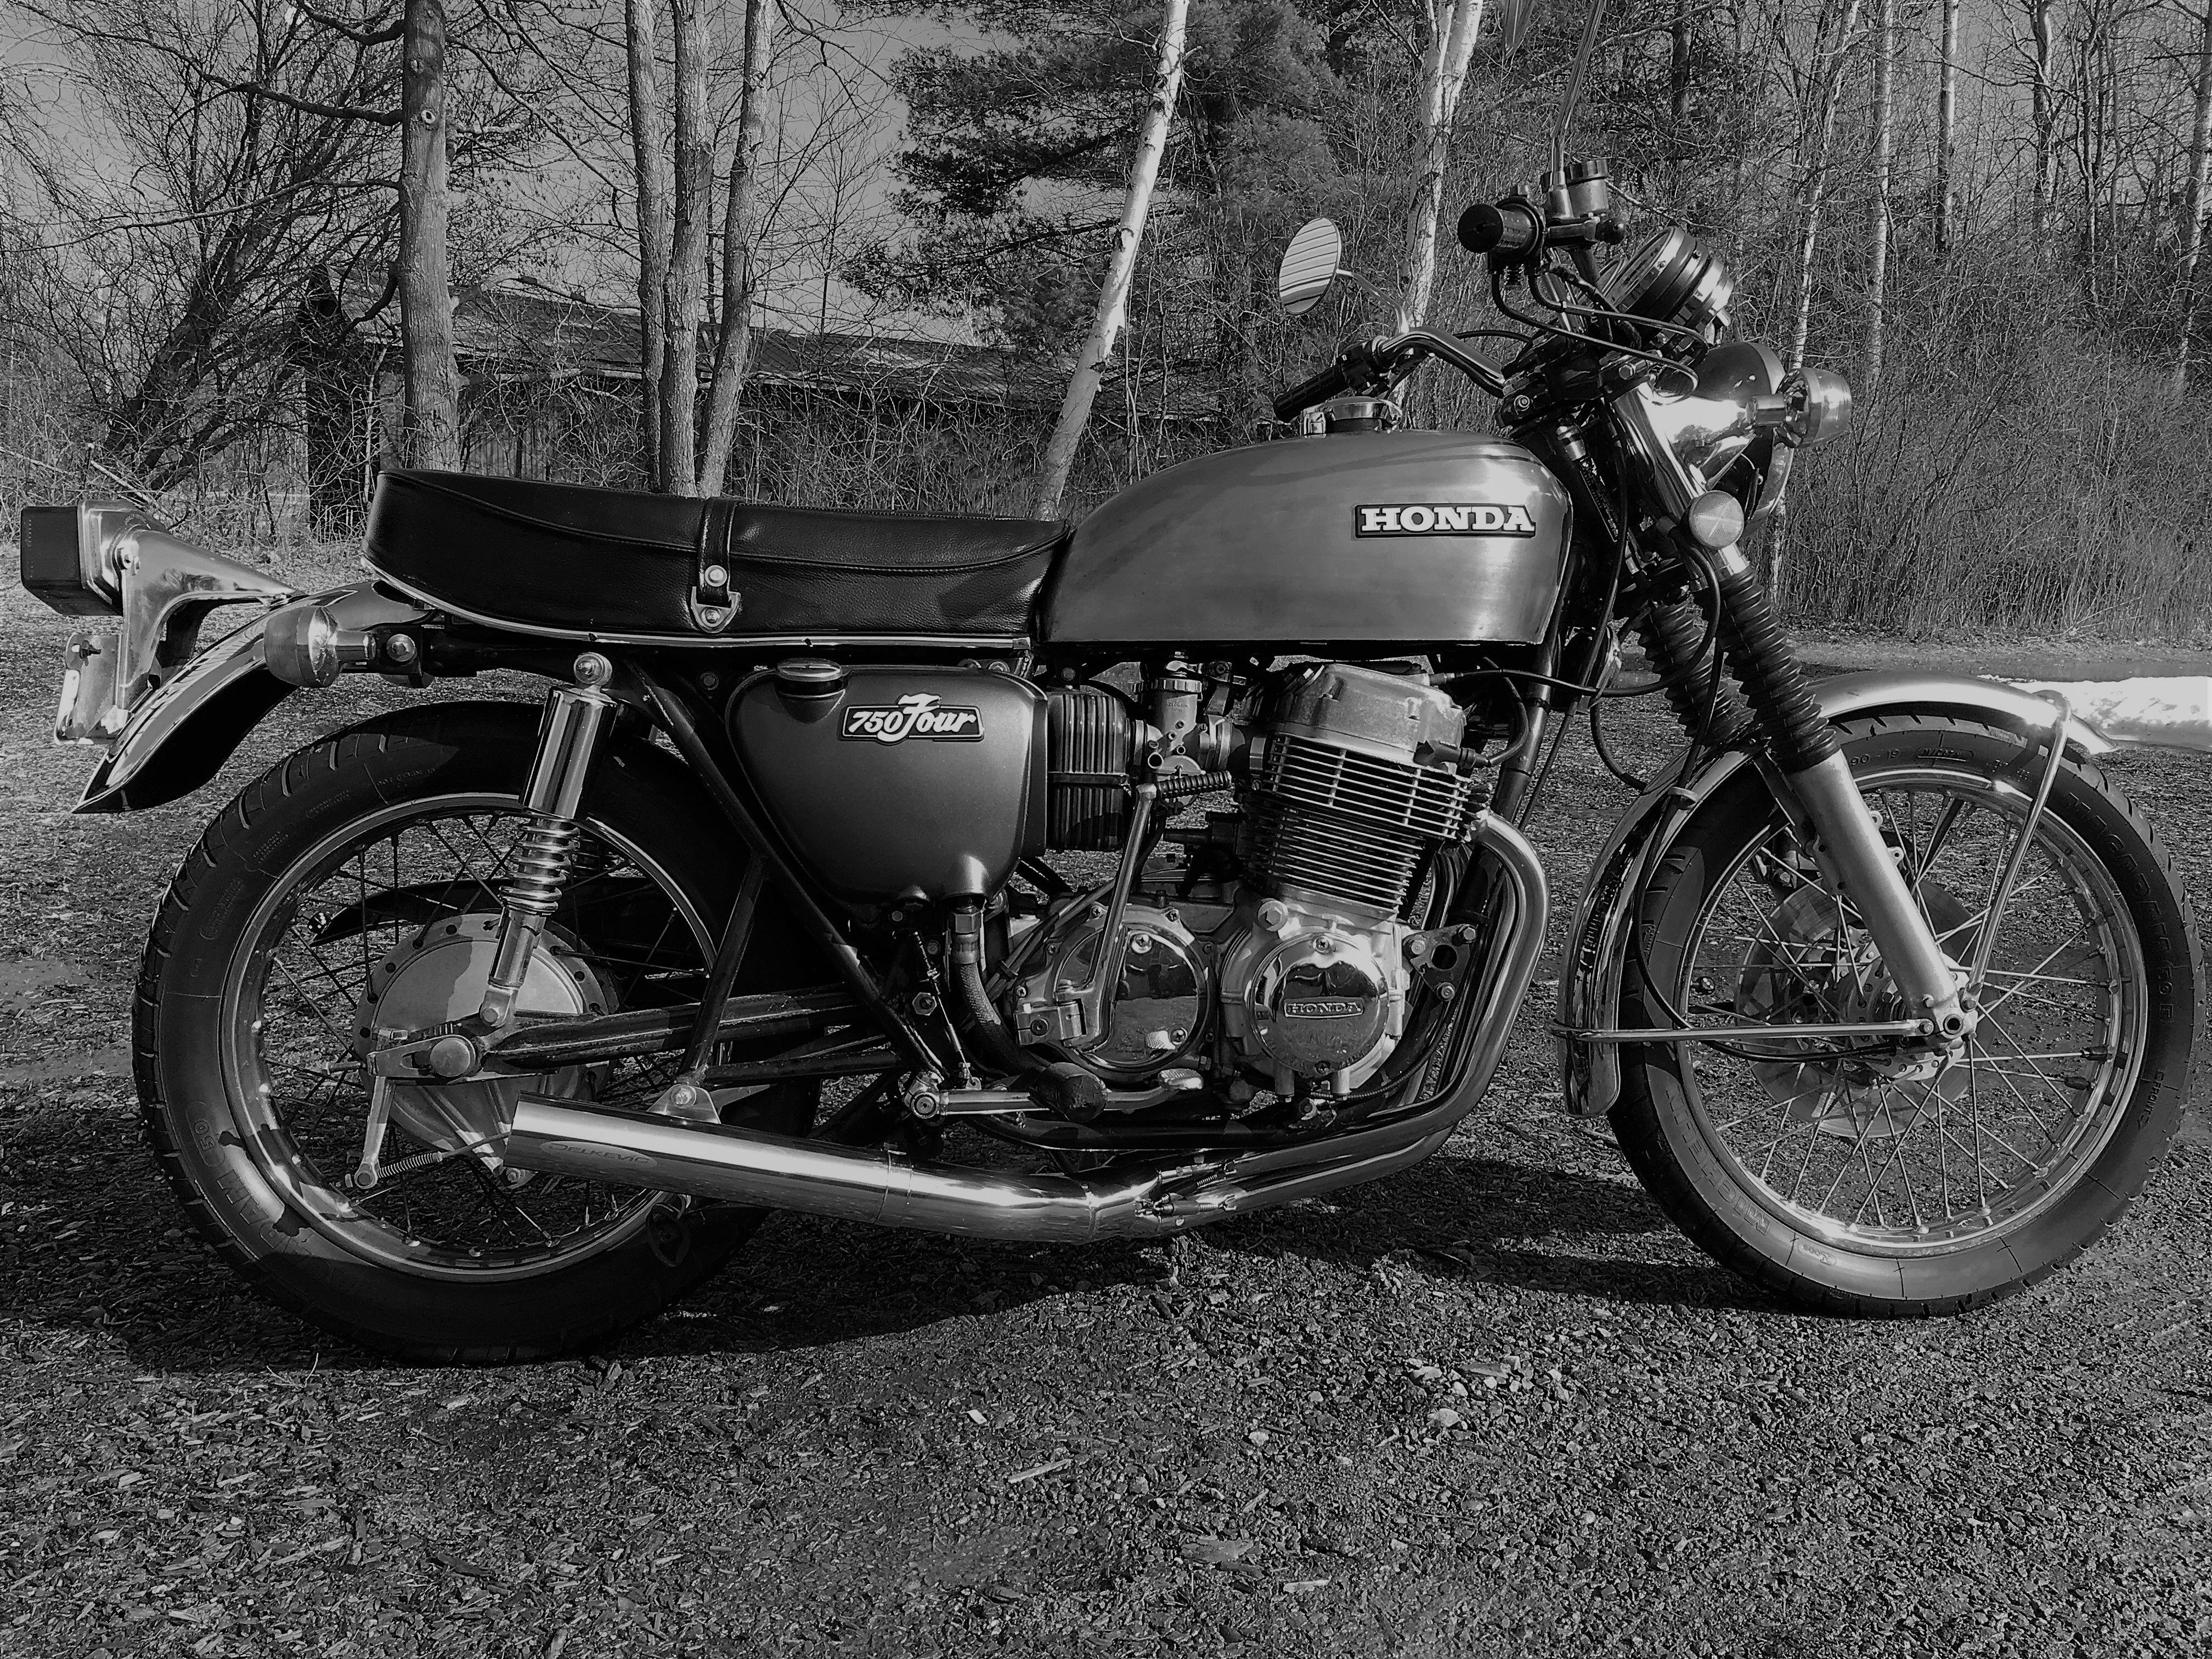 Honda CB750 Black And White Beauty